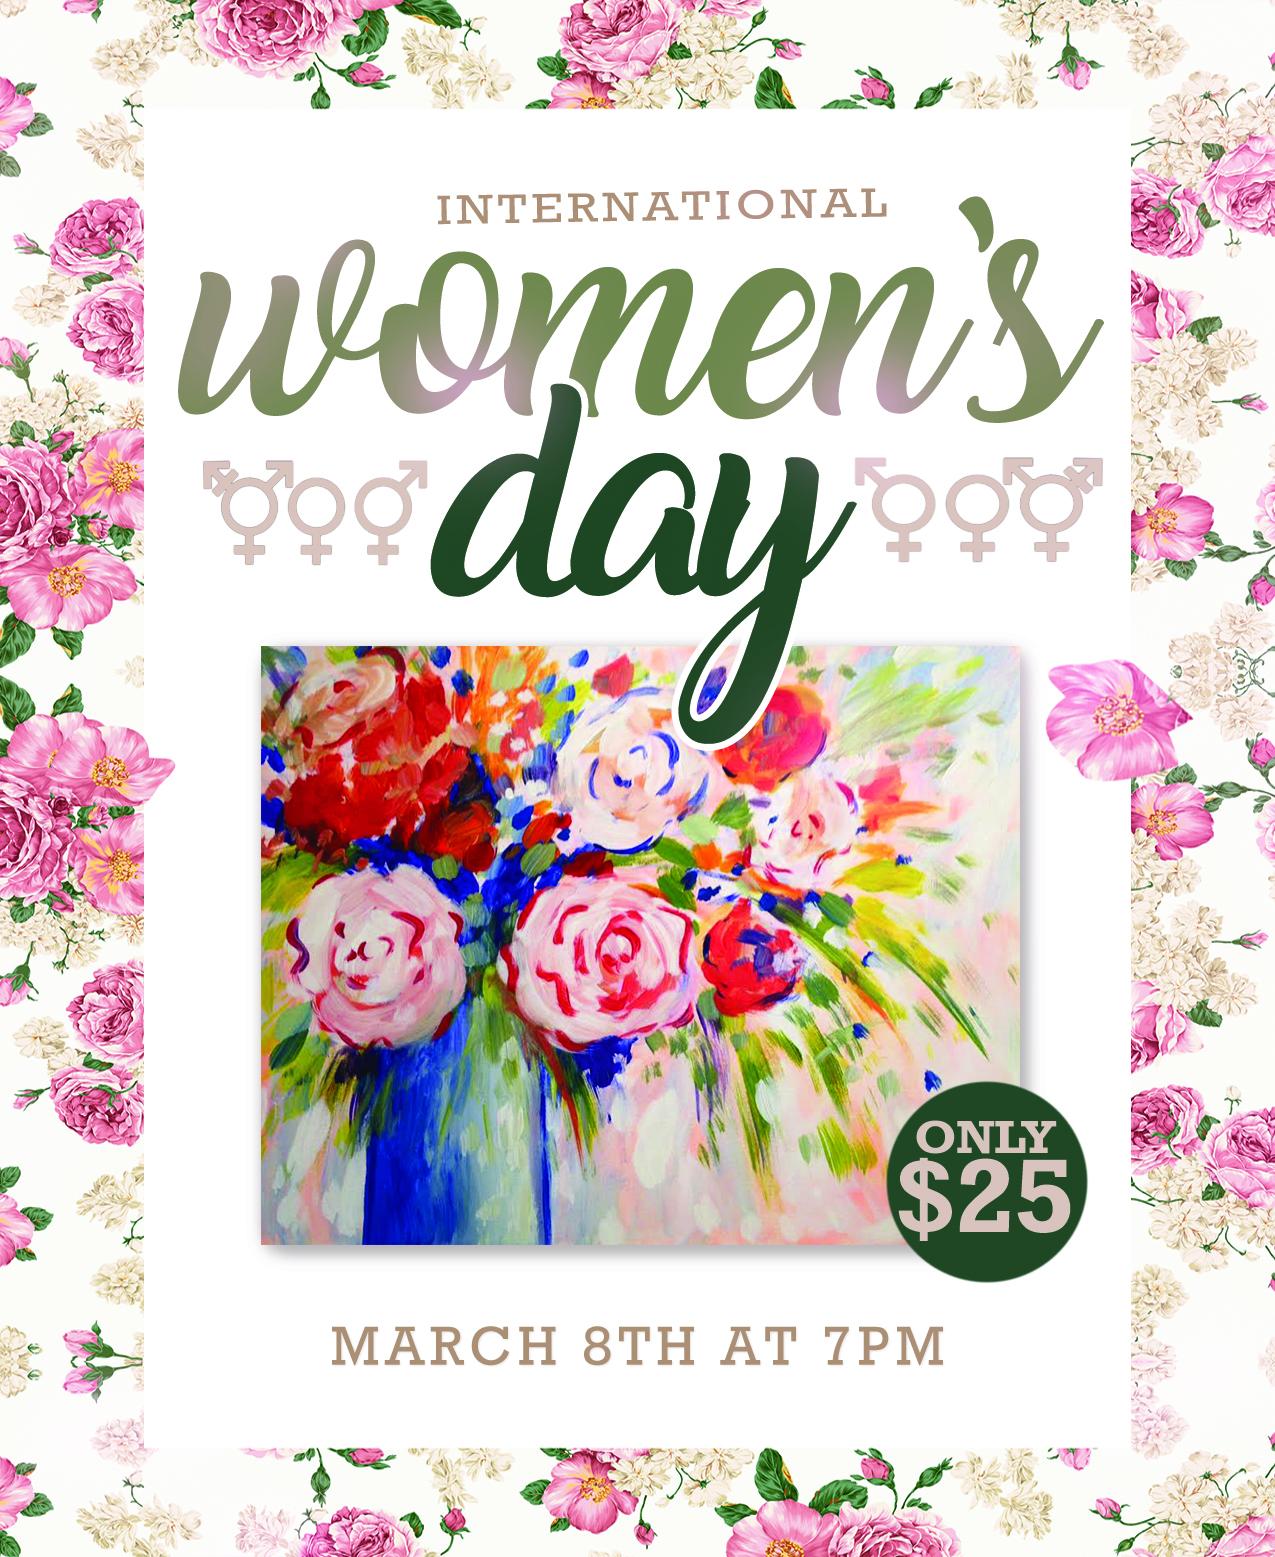 International Women's Day 2018!